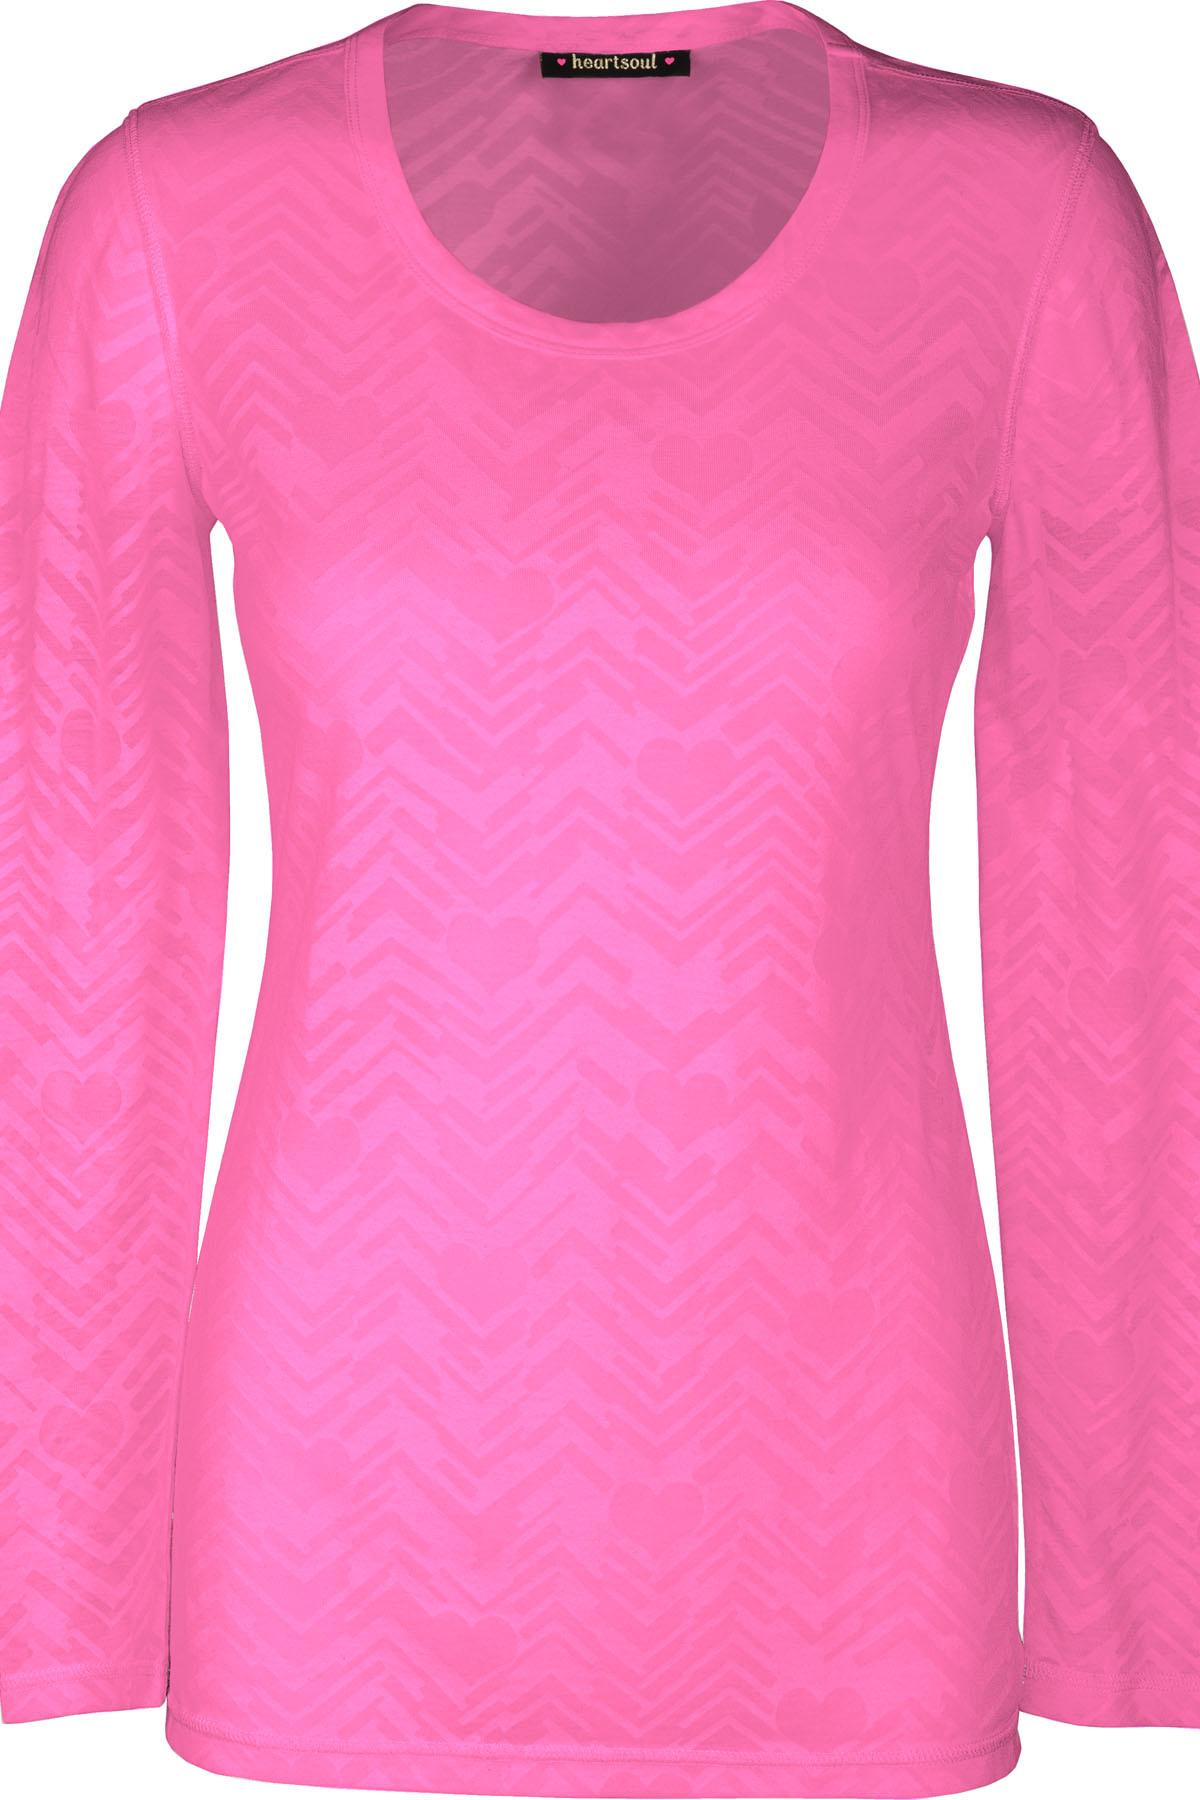 HEART SOUL Pink Heart Soul Women's Underscrub Shirt 20820